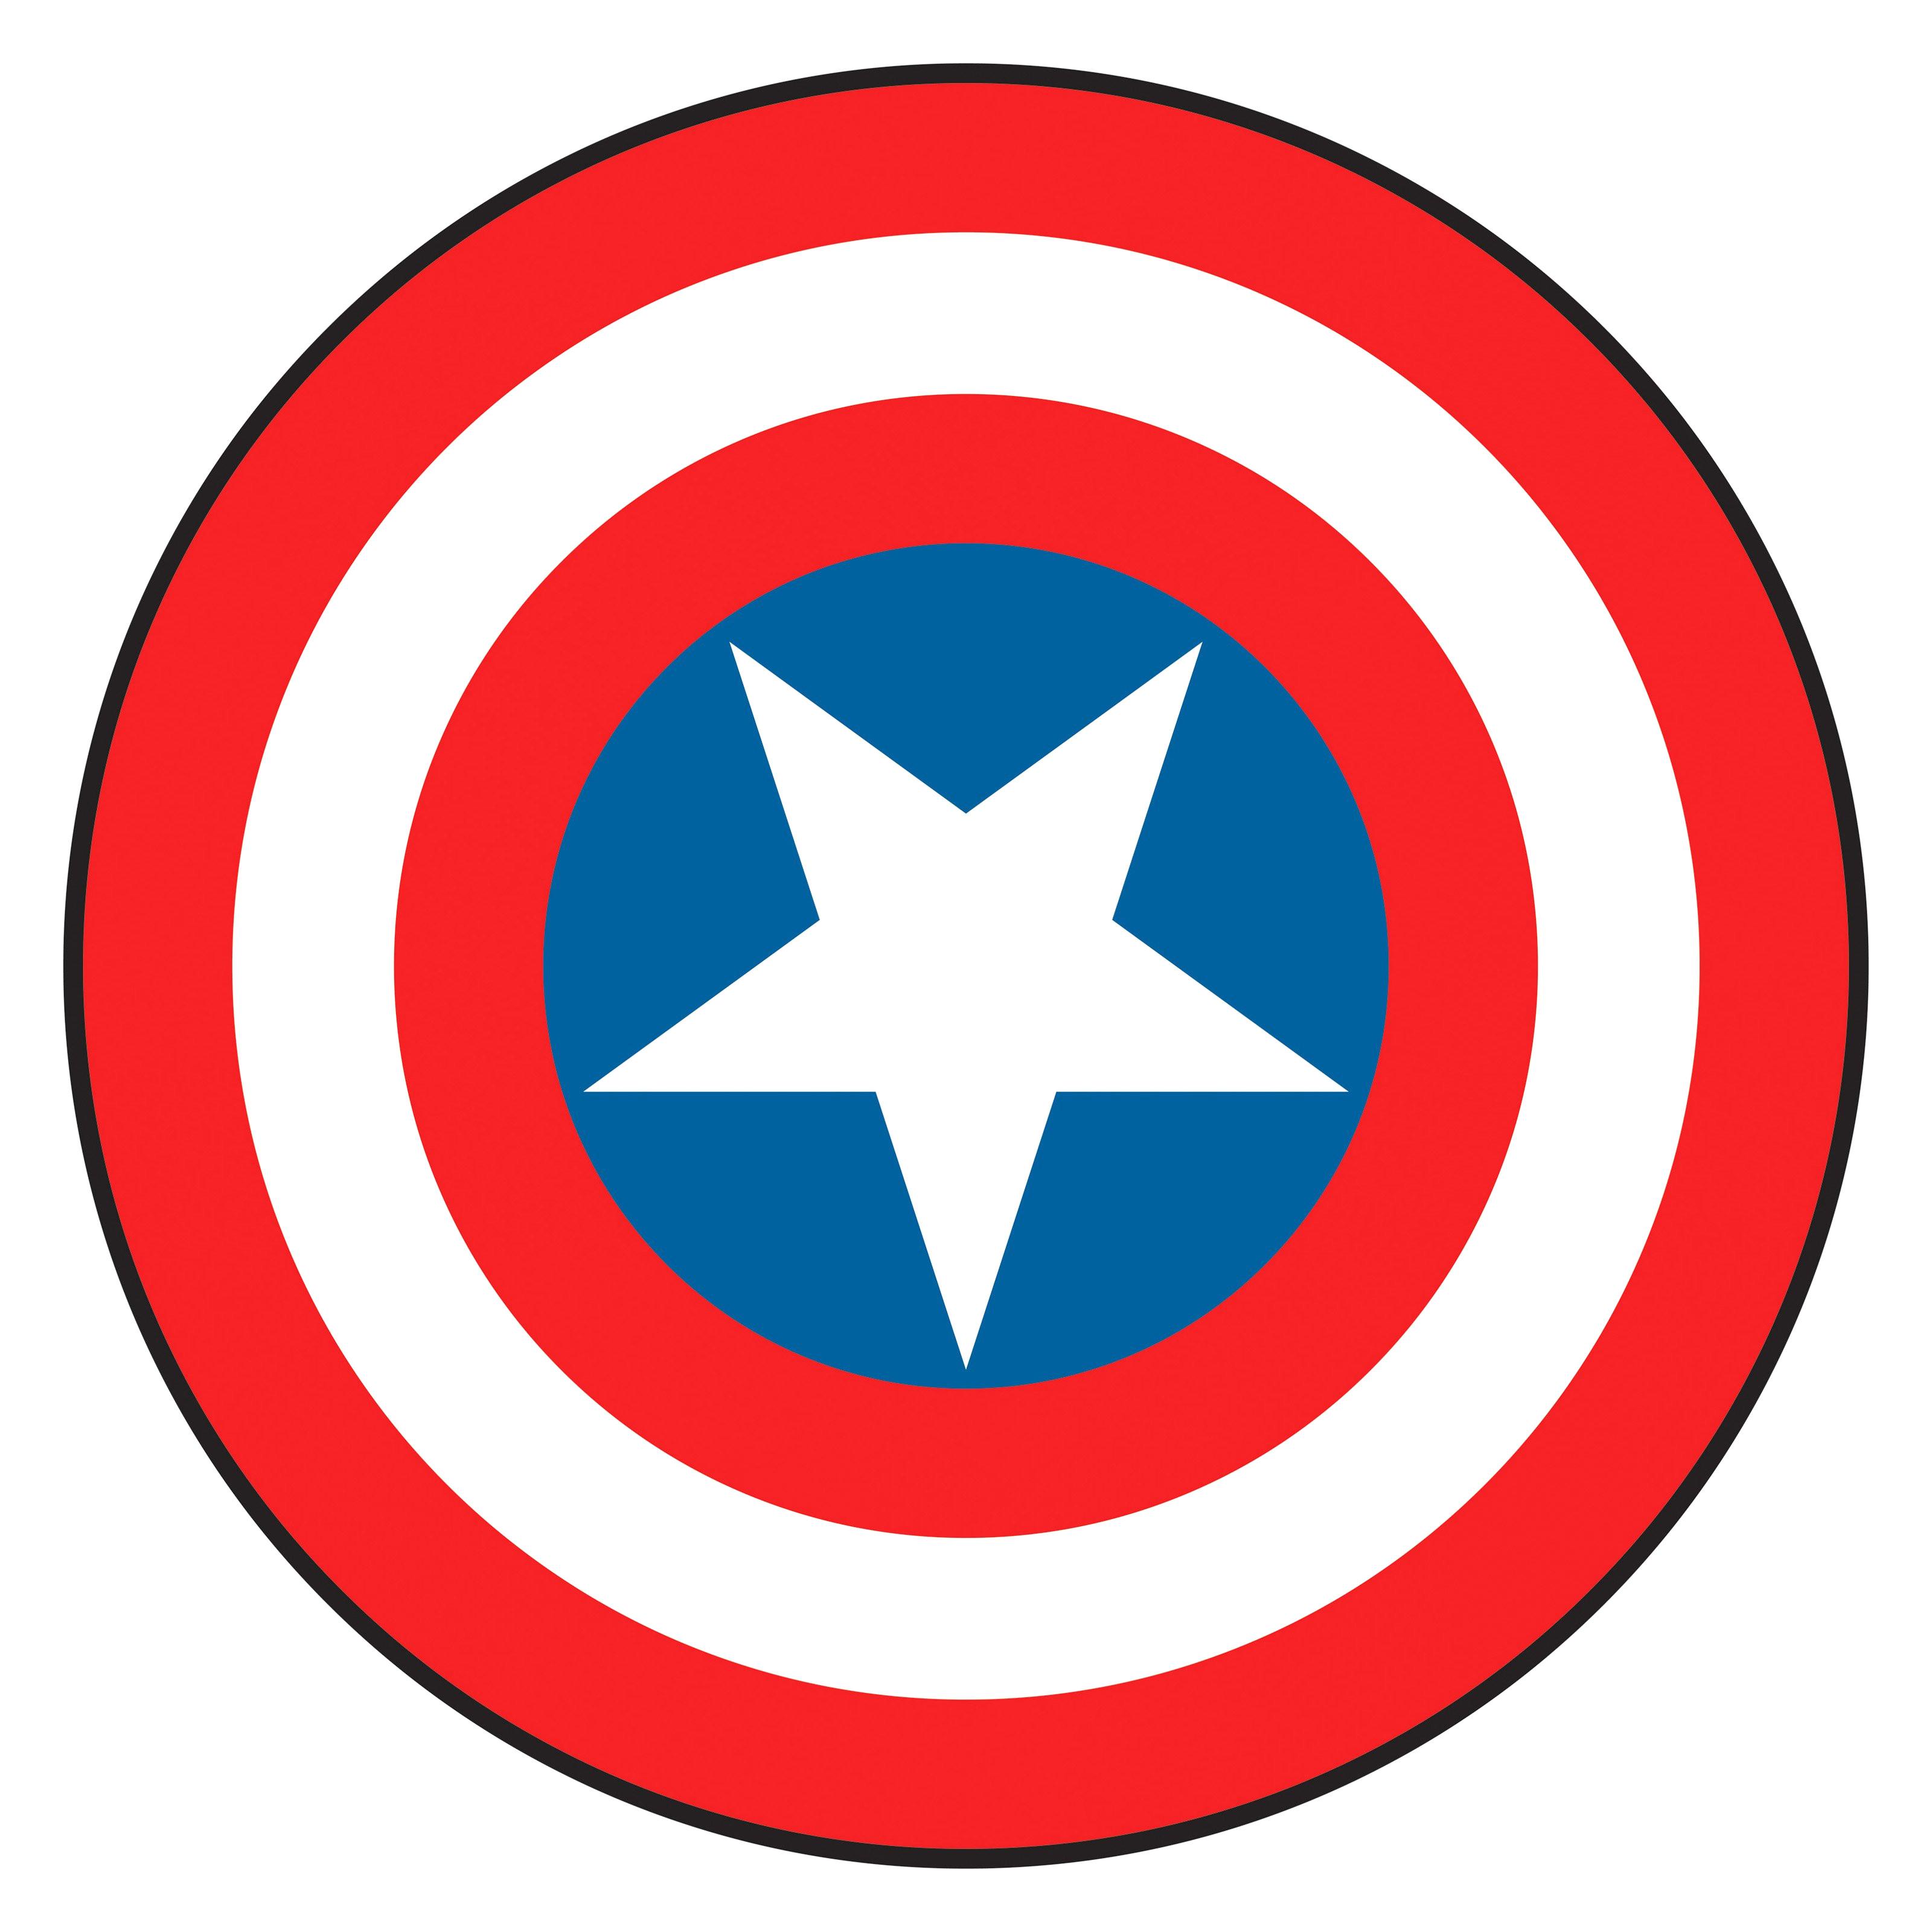 3200x3200 Captain America Shield Printable Jkfloodrelief Org Adorable